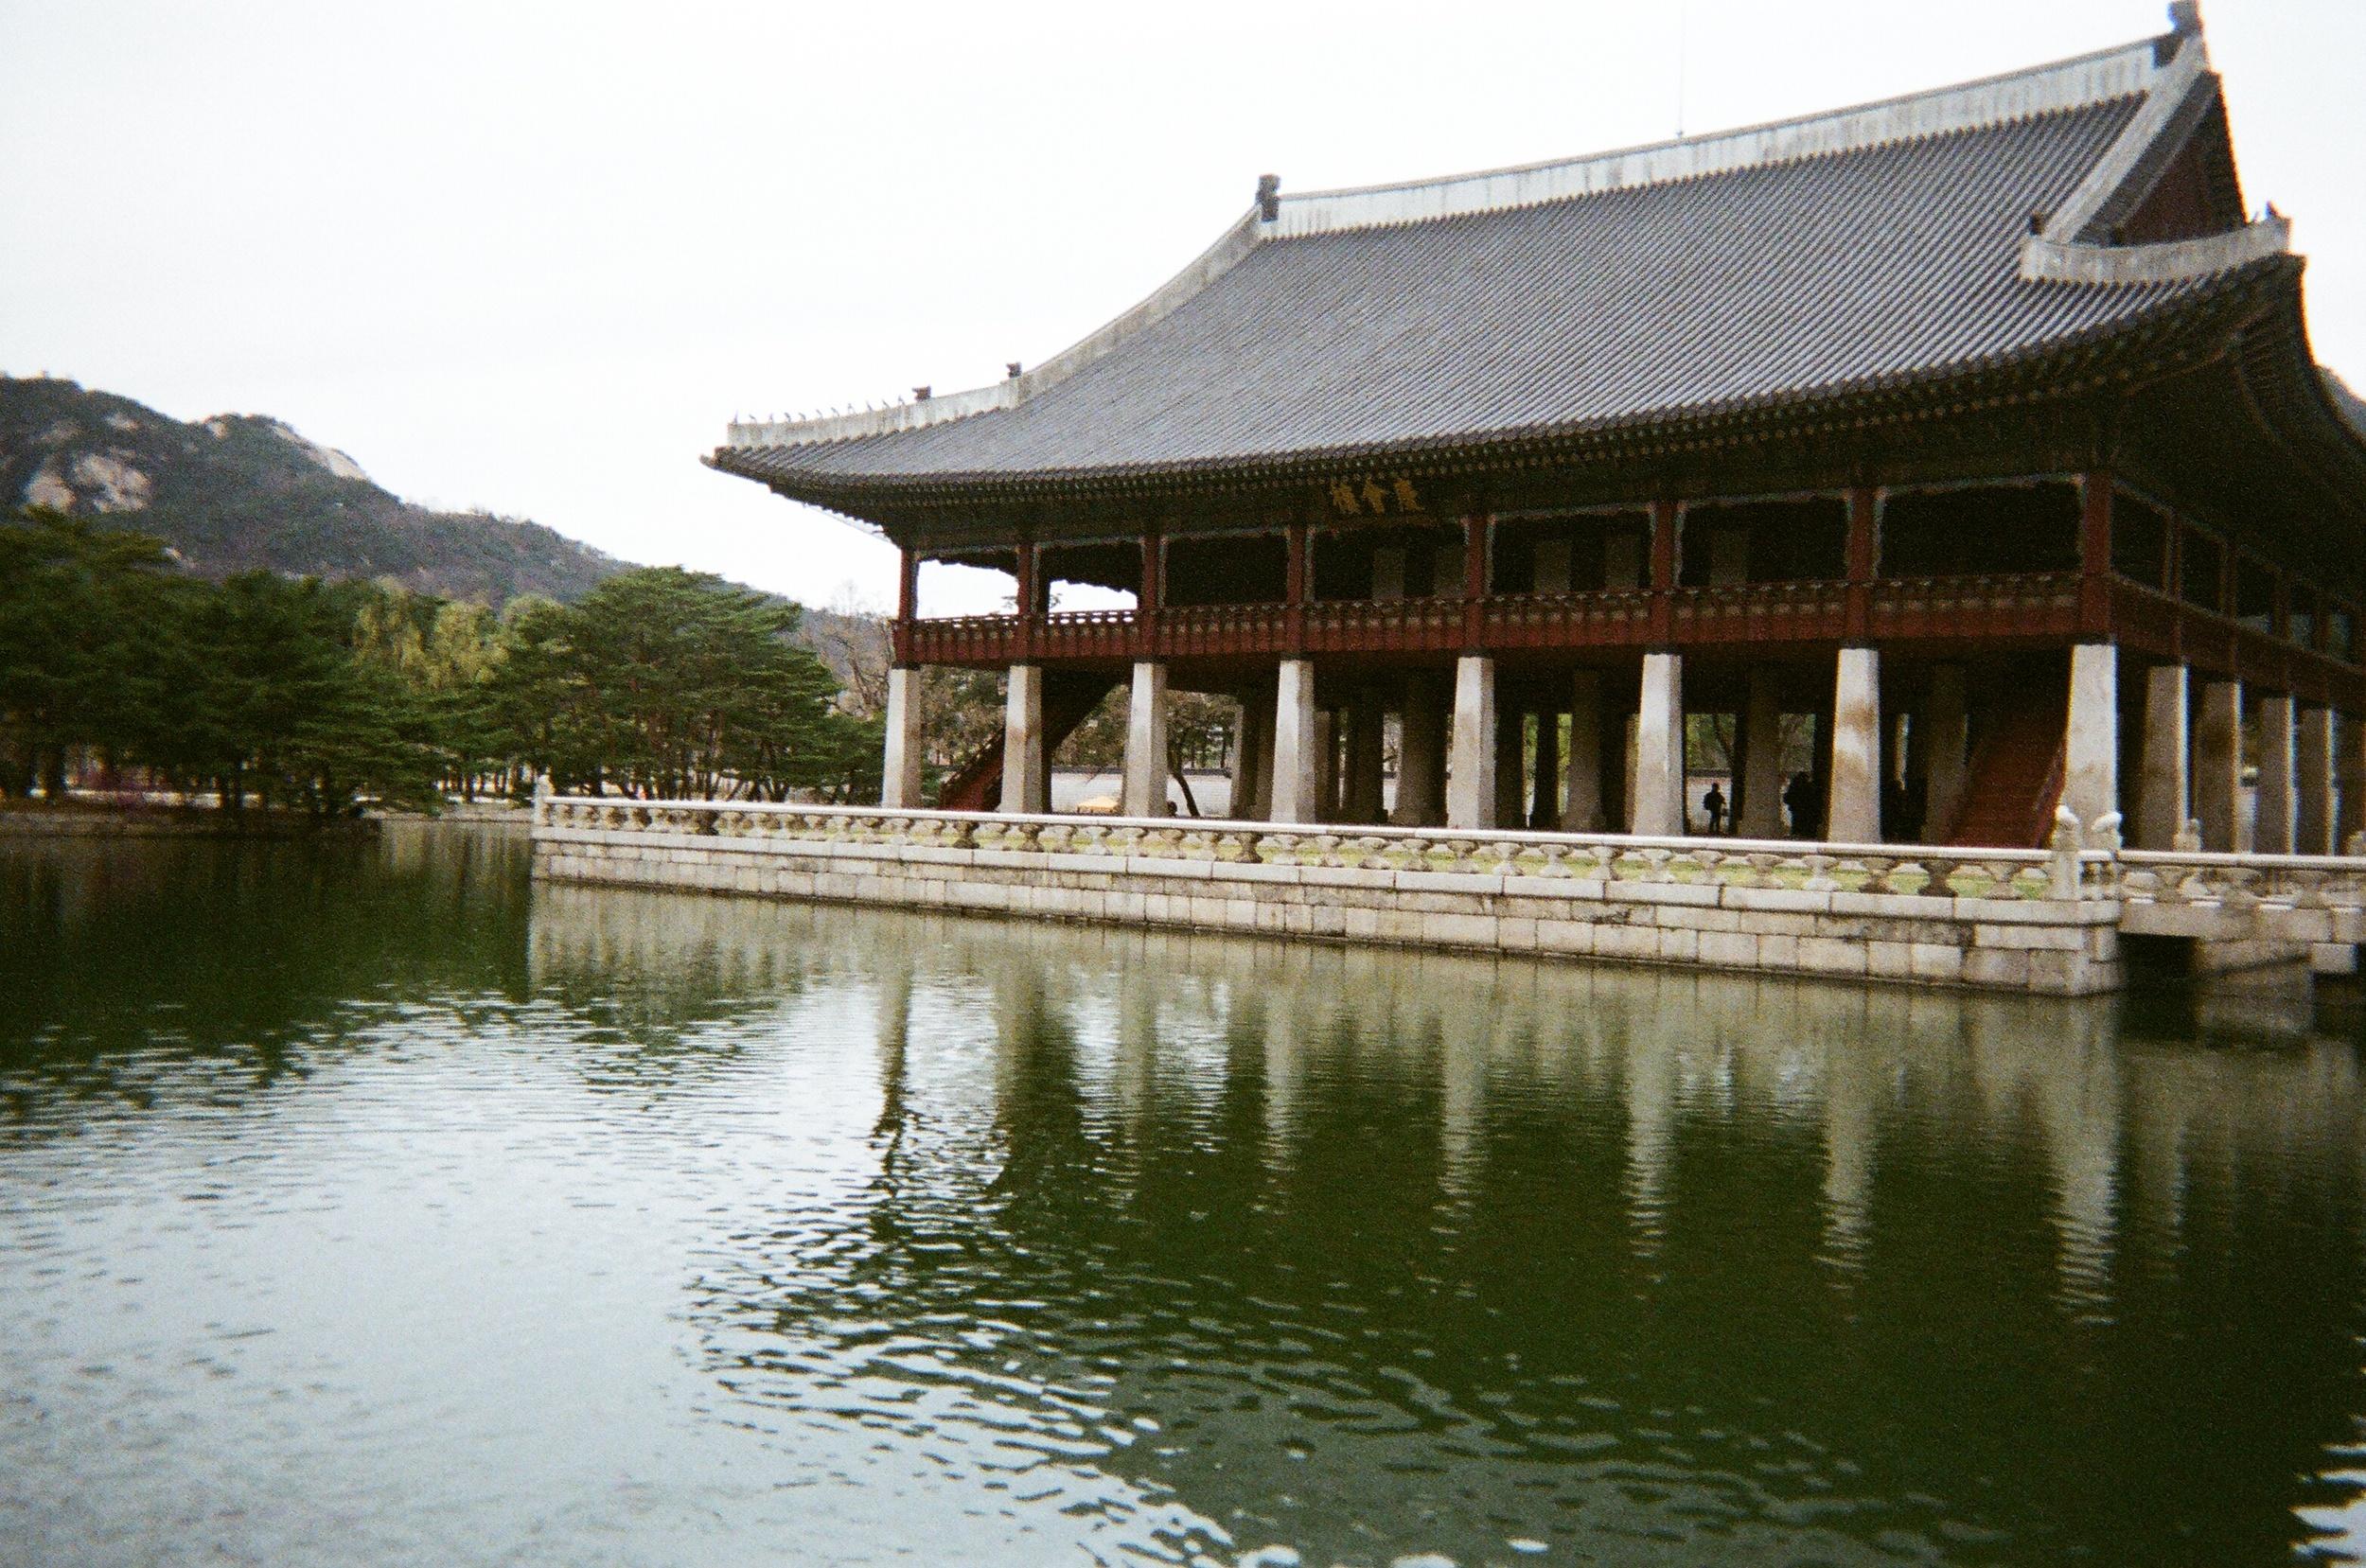 gyeongbokgung pavillion